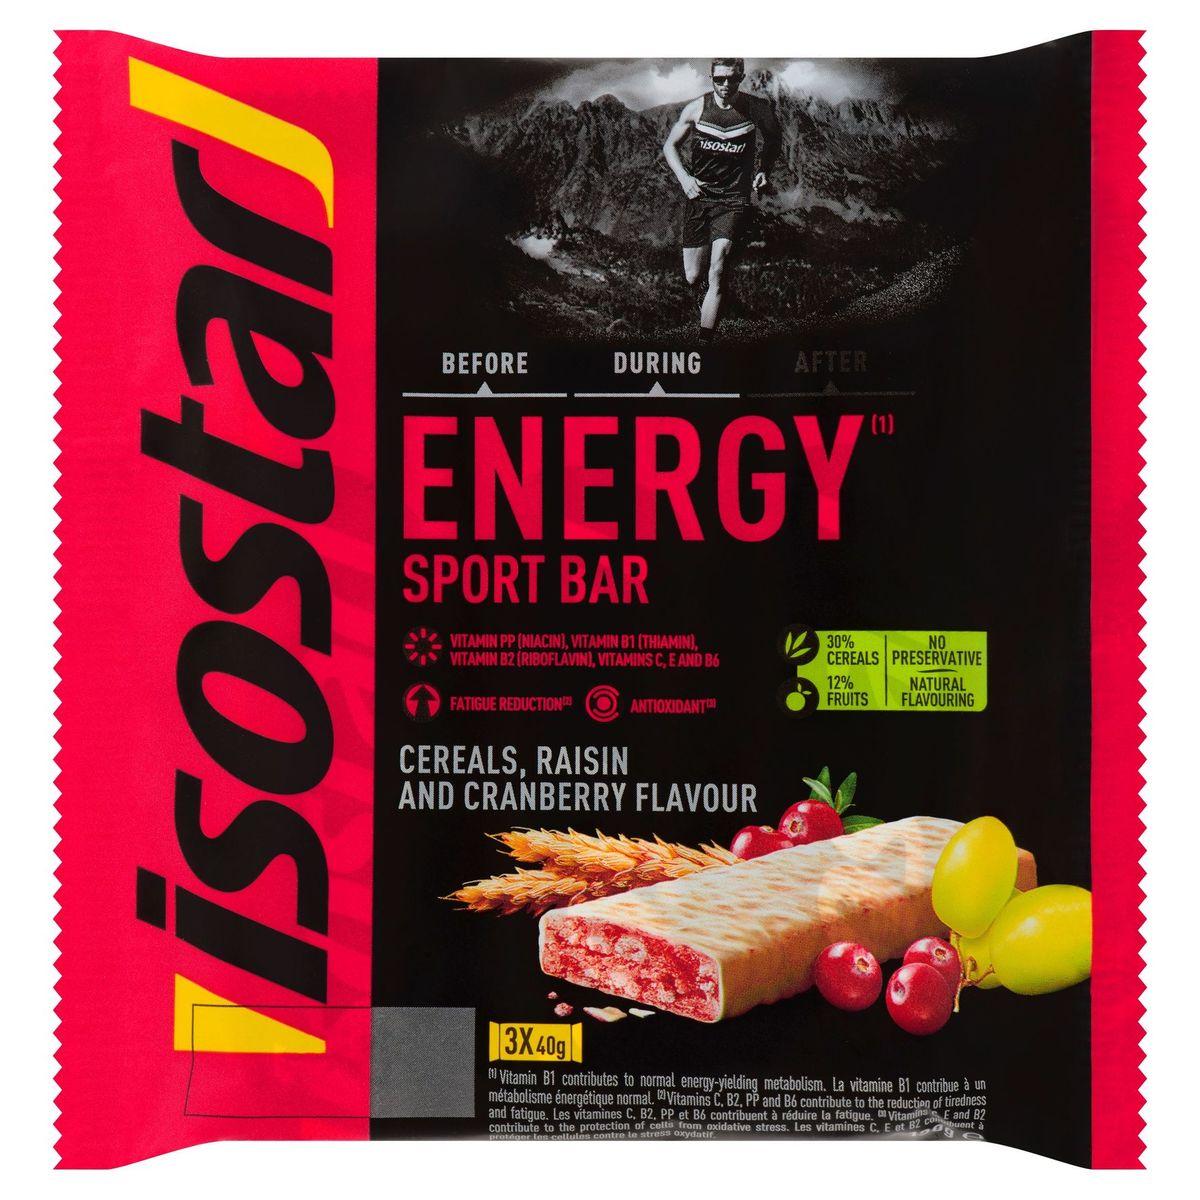 Isostar Energy Sport Bar Cereals, Raisin and Cranberry Flavour 3 x 40 g